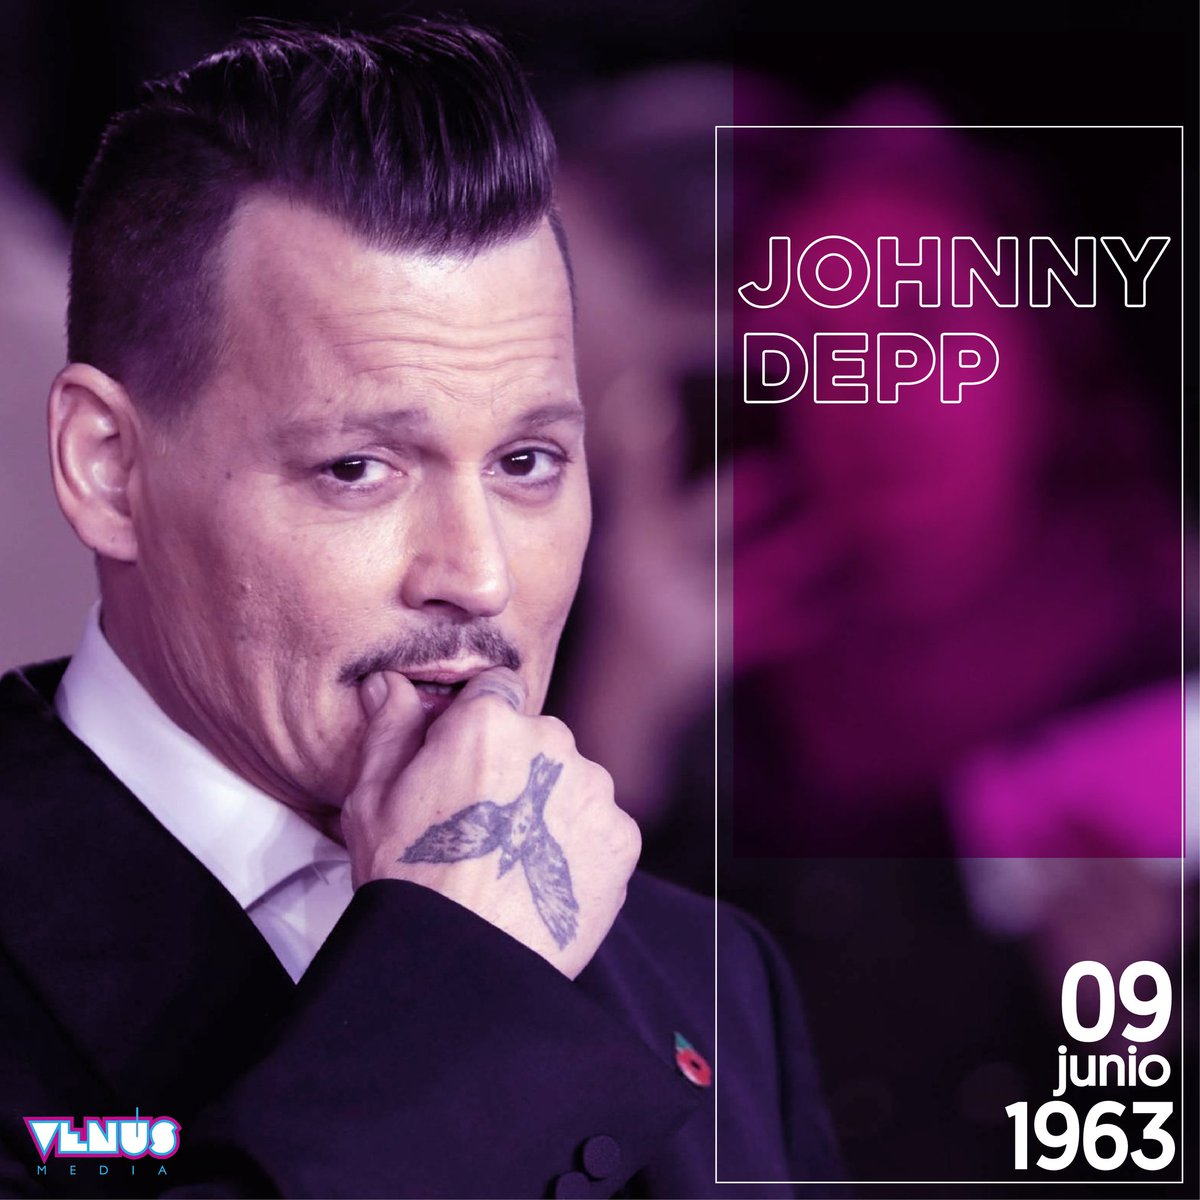 @venusmedia's photo on Johnny Depp